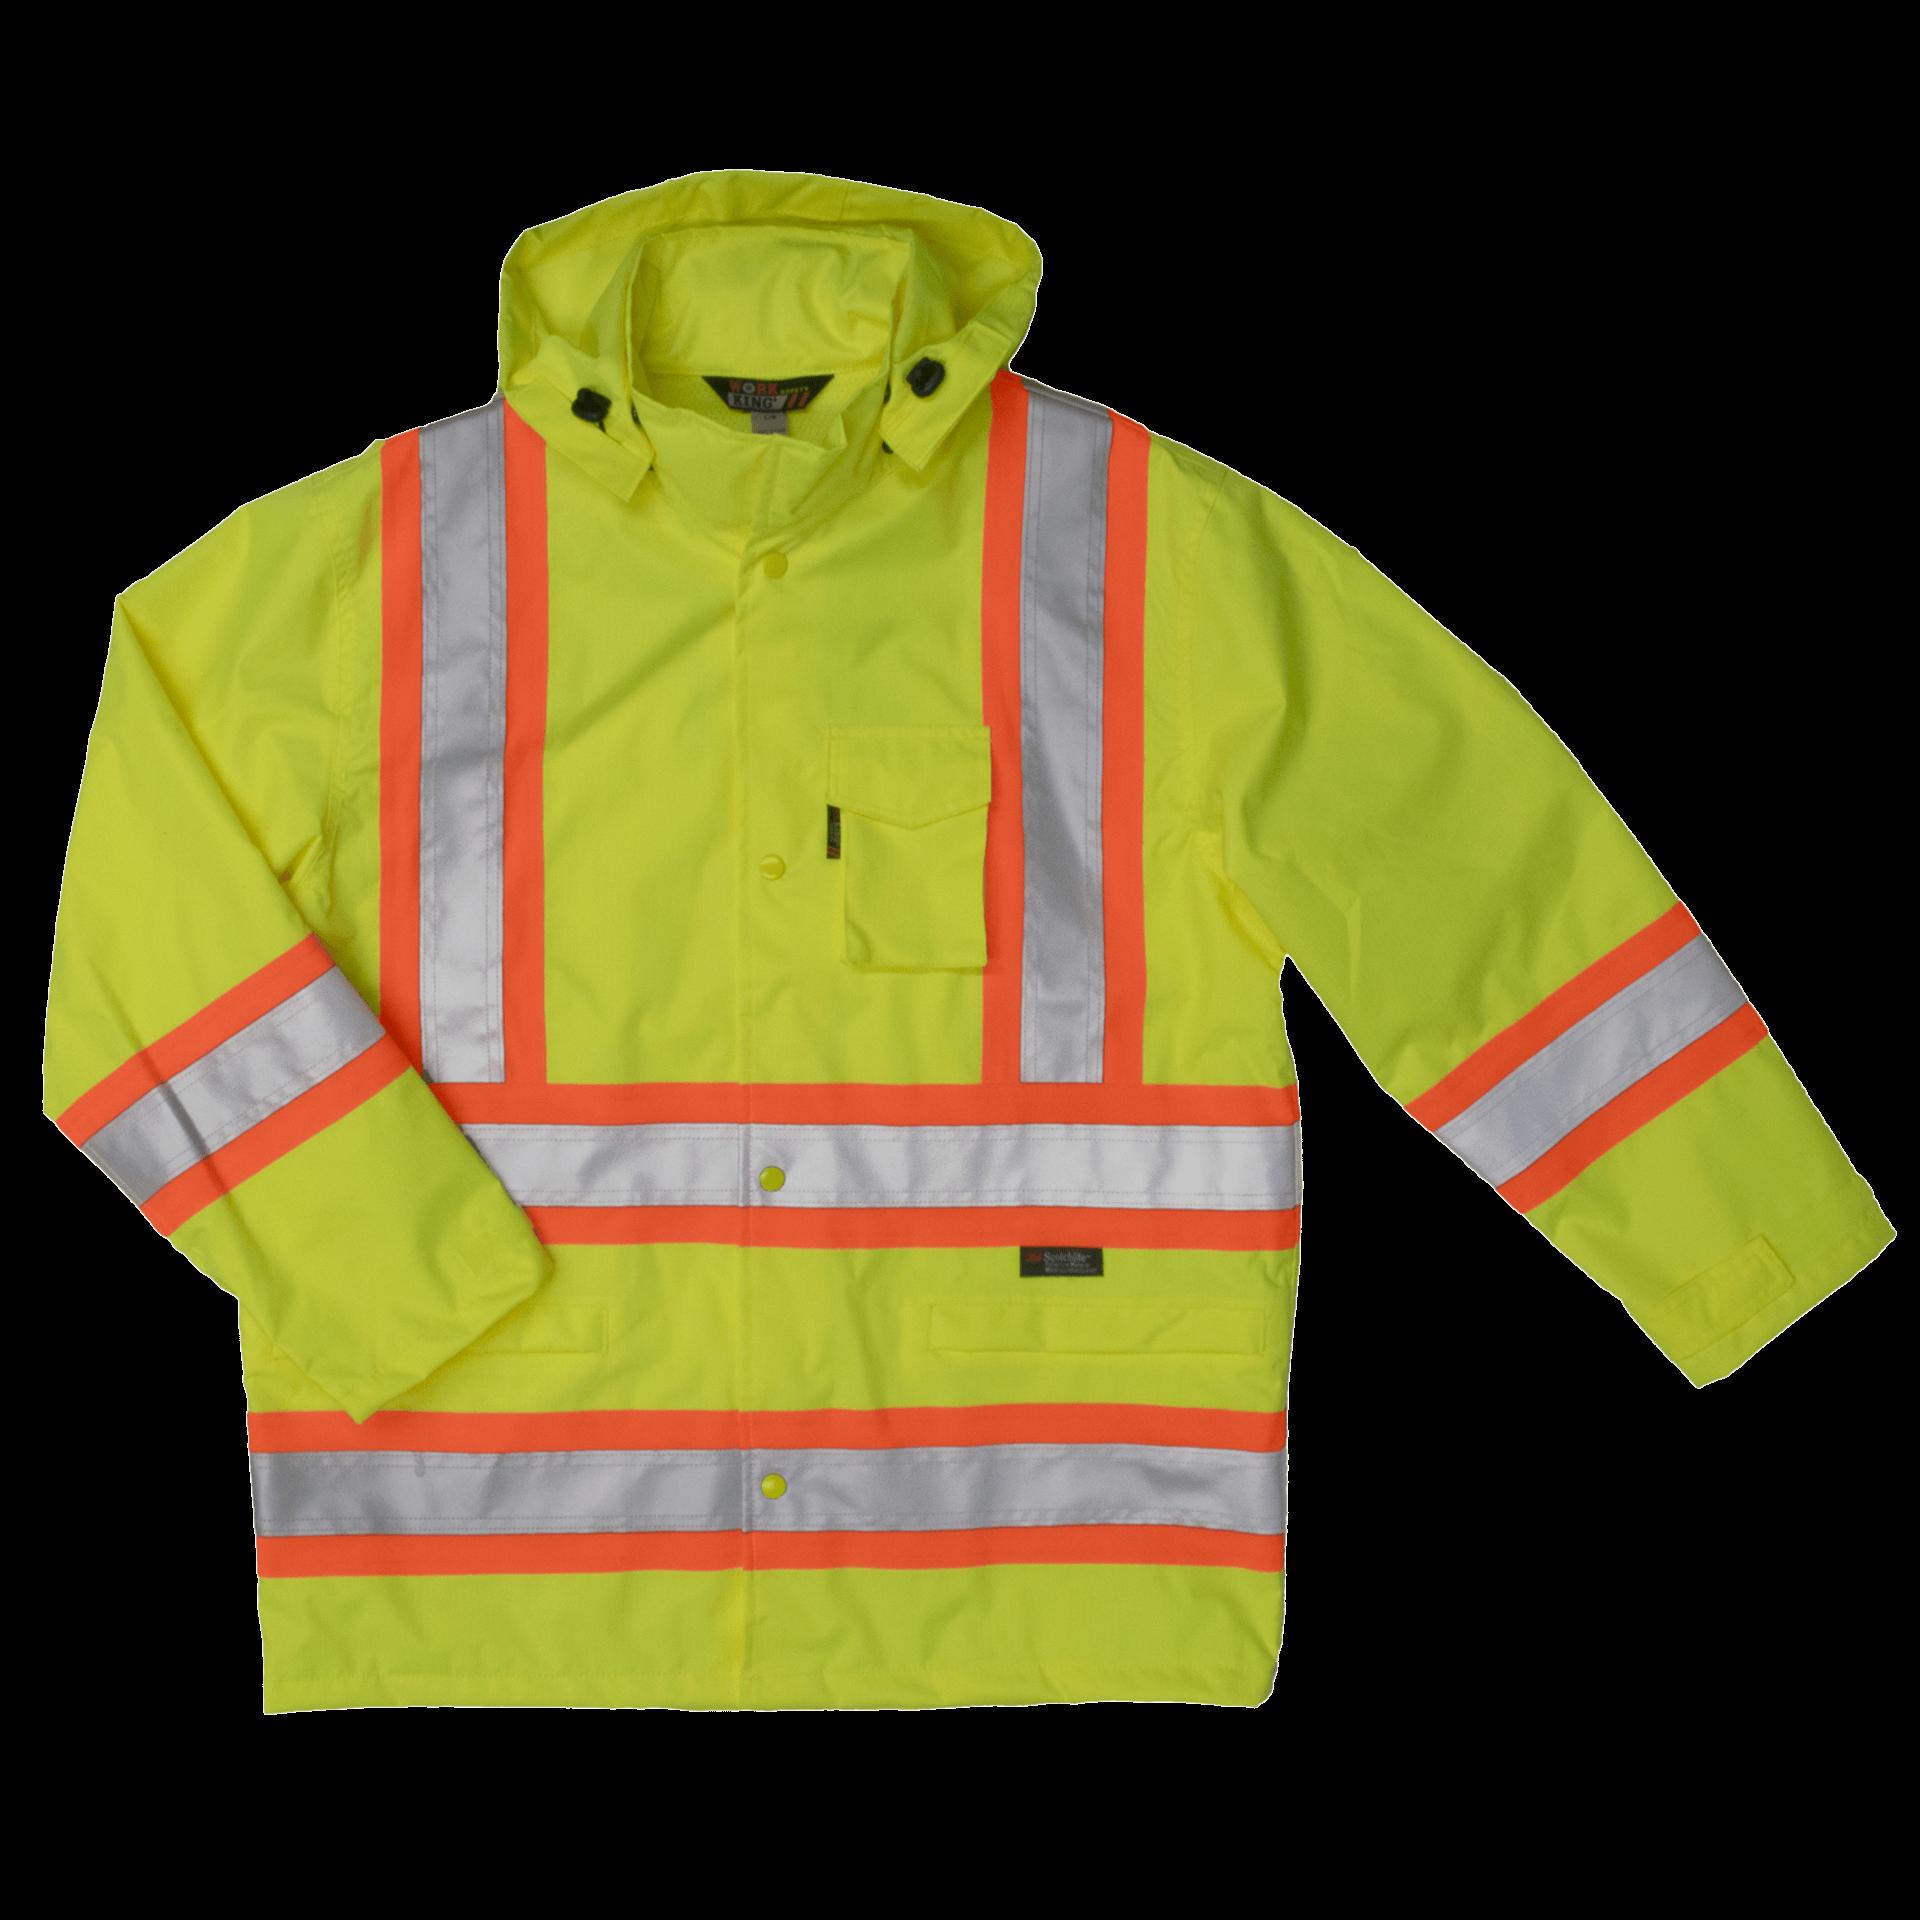 https://0901.nccdn.net/4_2/000/000/009/97a/s372-flgr-f-work-king-safety-by-tough-duck-mens-300d-safety-rain.png